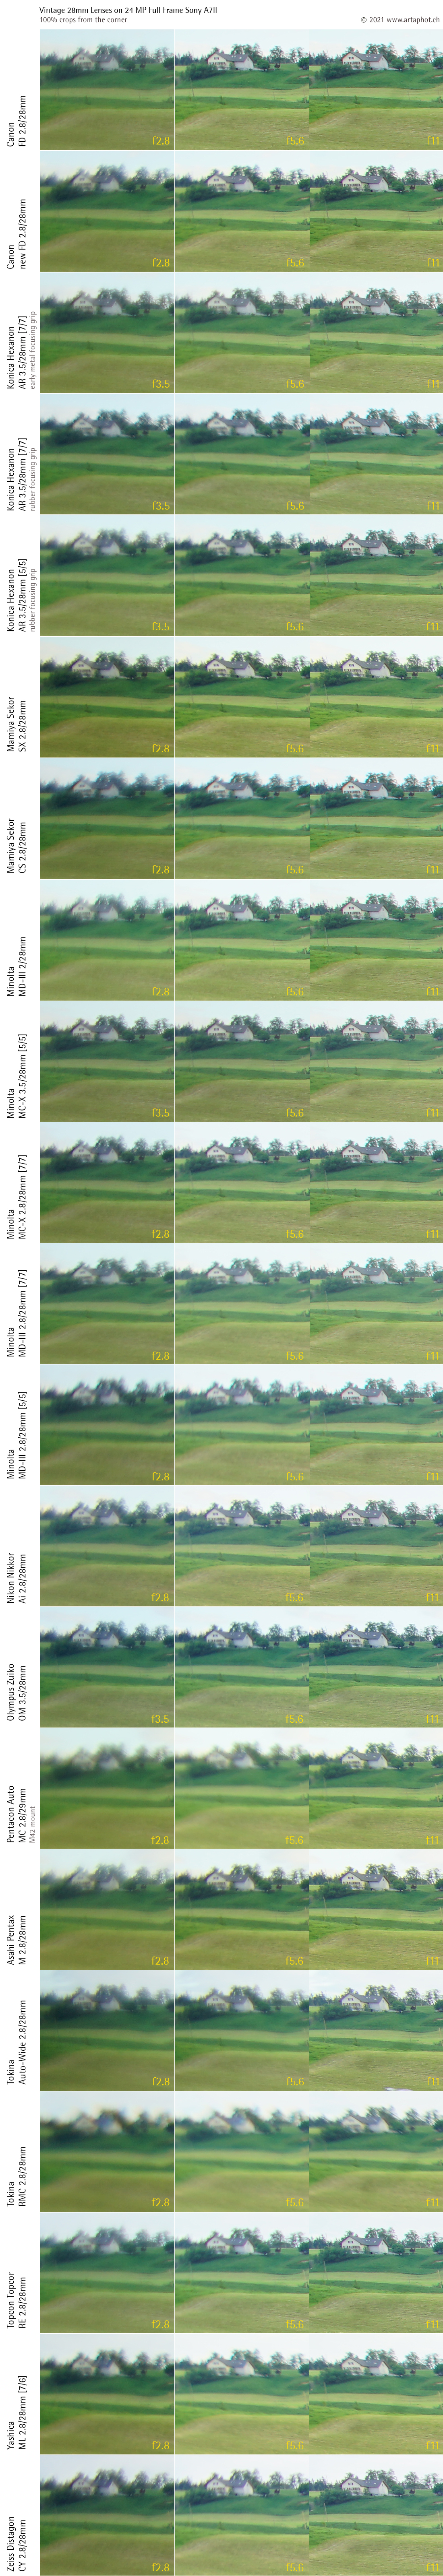 artaphot TEST 28mm primes corrctd